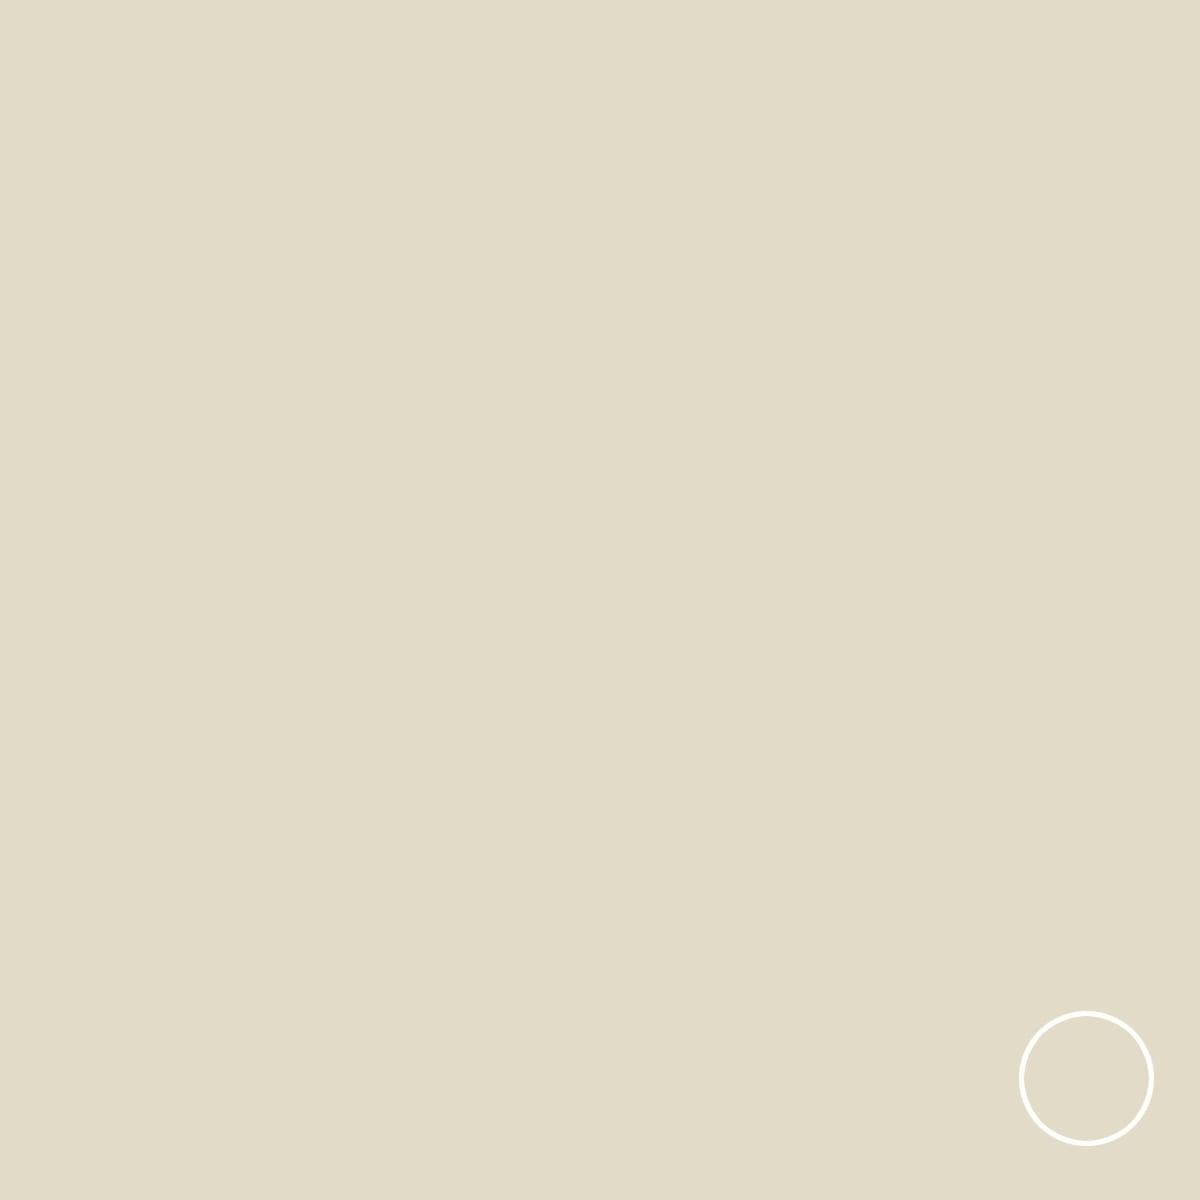 ORGANIC LINE (10ml) - PIGMENT CAMOUFLAGE 10 ORGANICLINE AMIEA (10 ml)